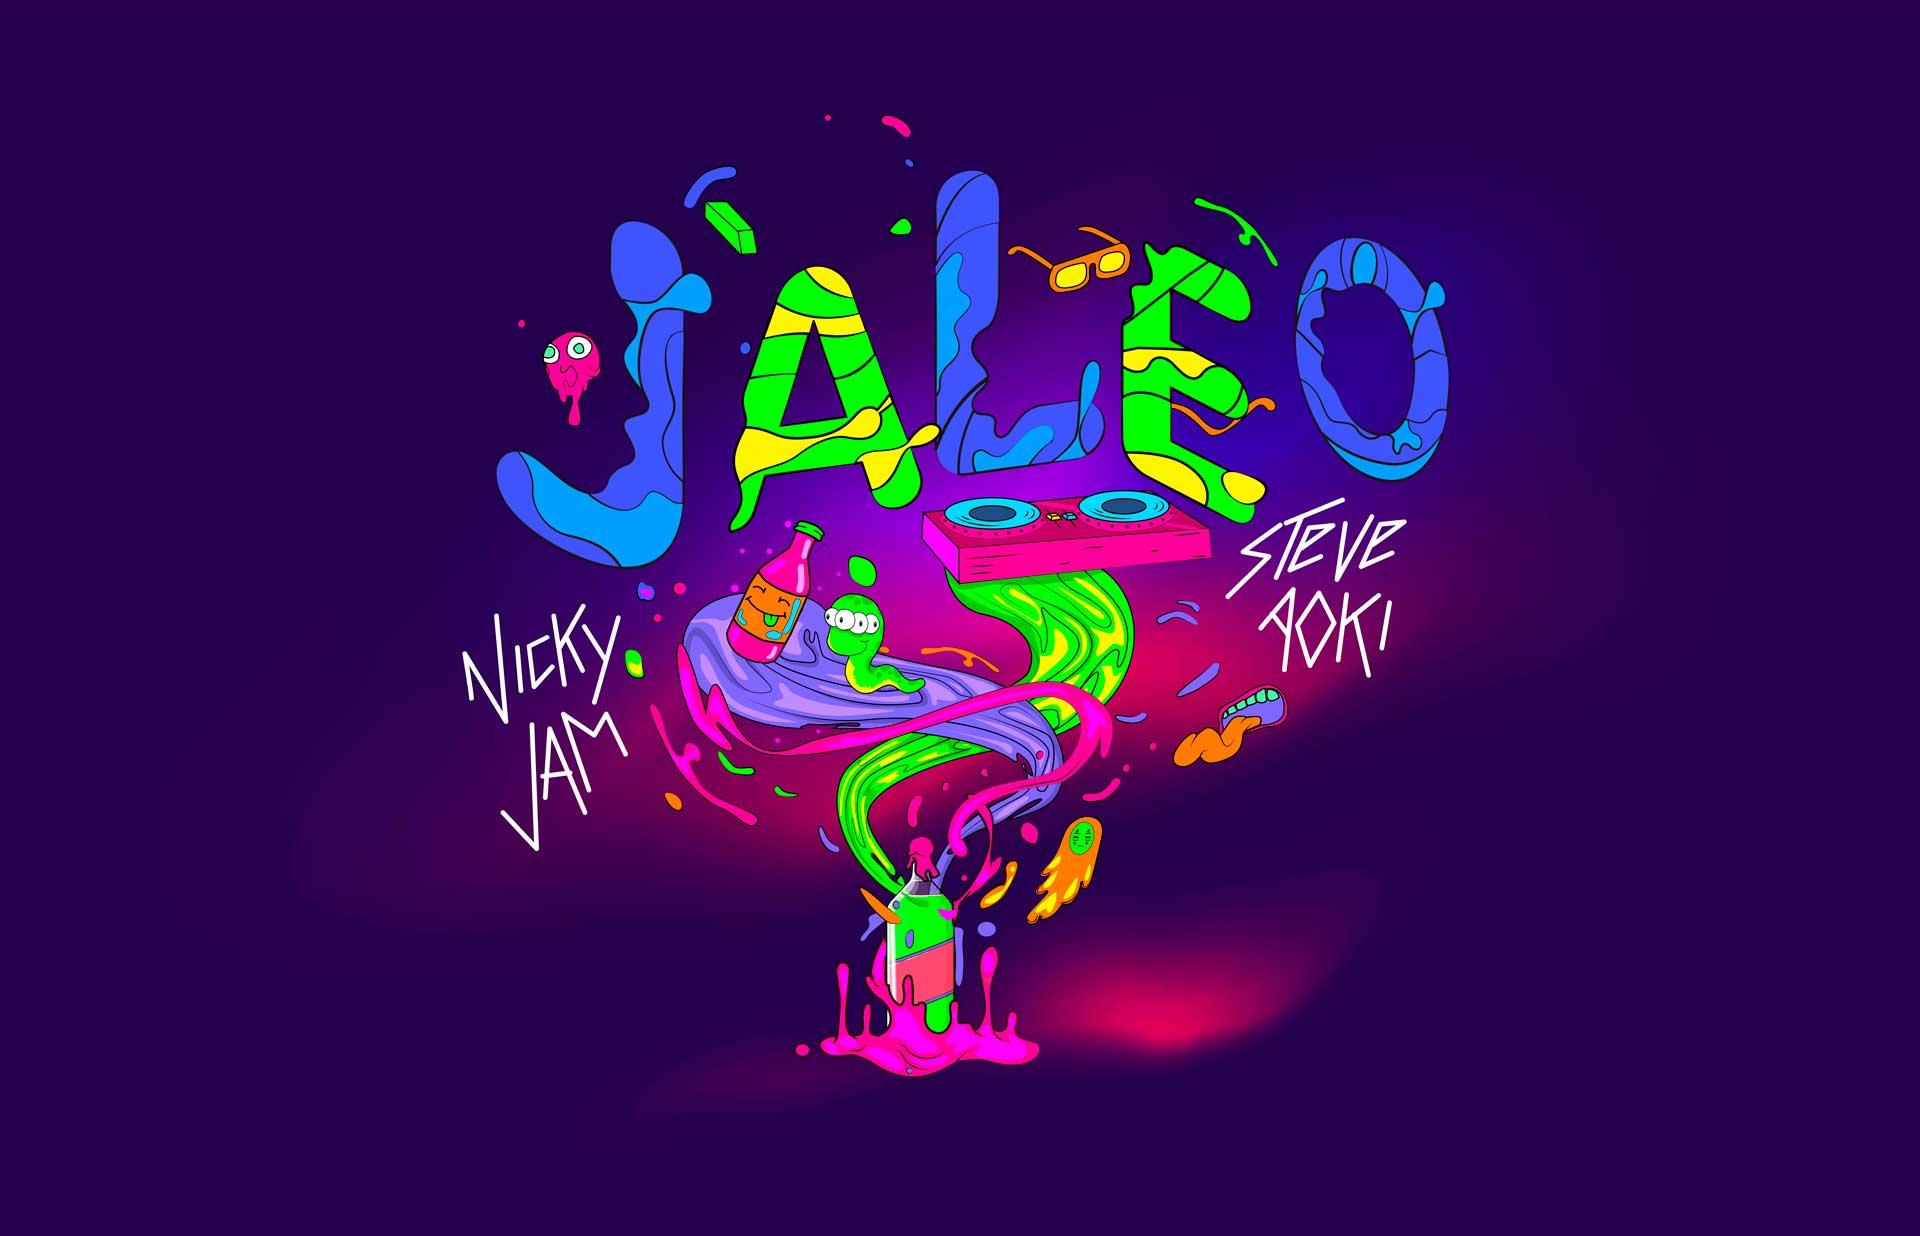 Nicky Jam Y Steve Aoki Jaleo 2heart